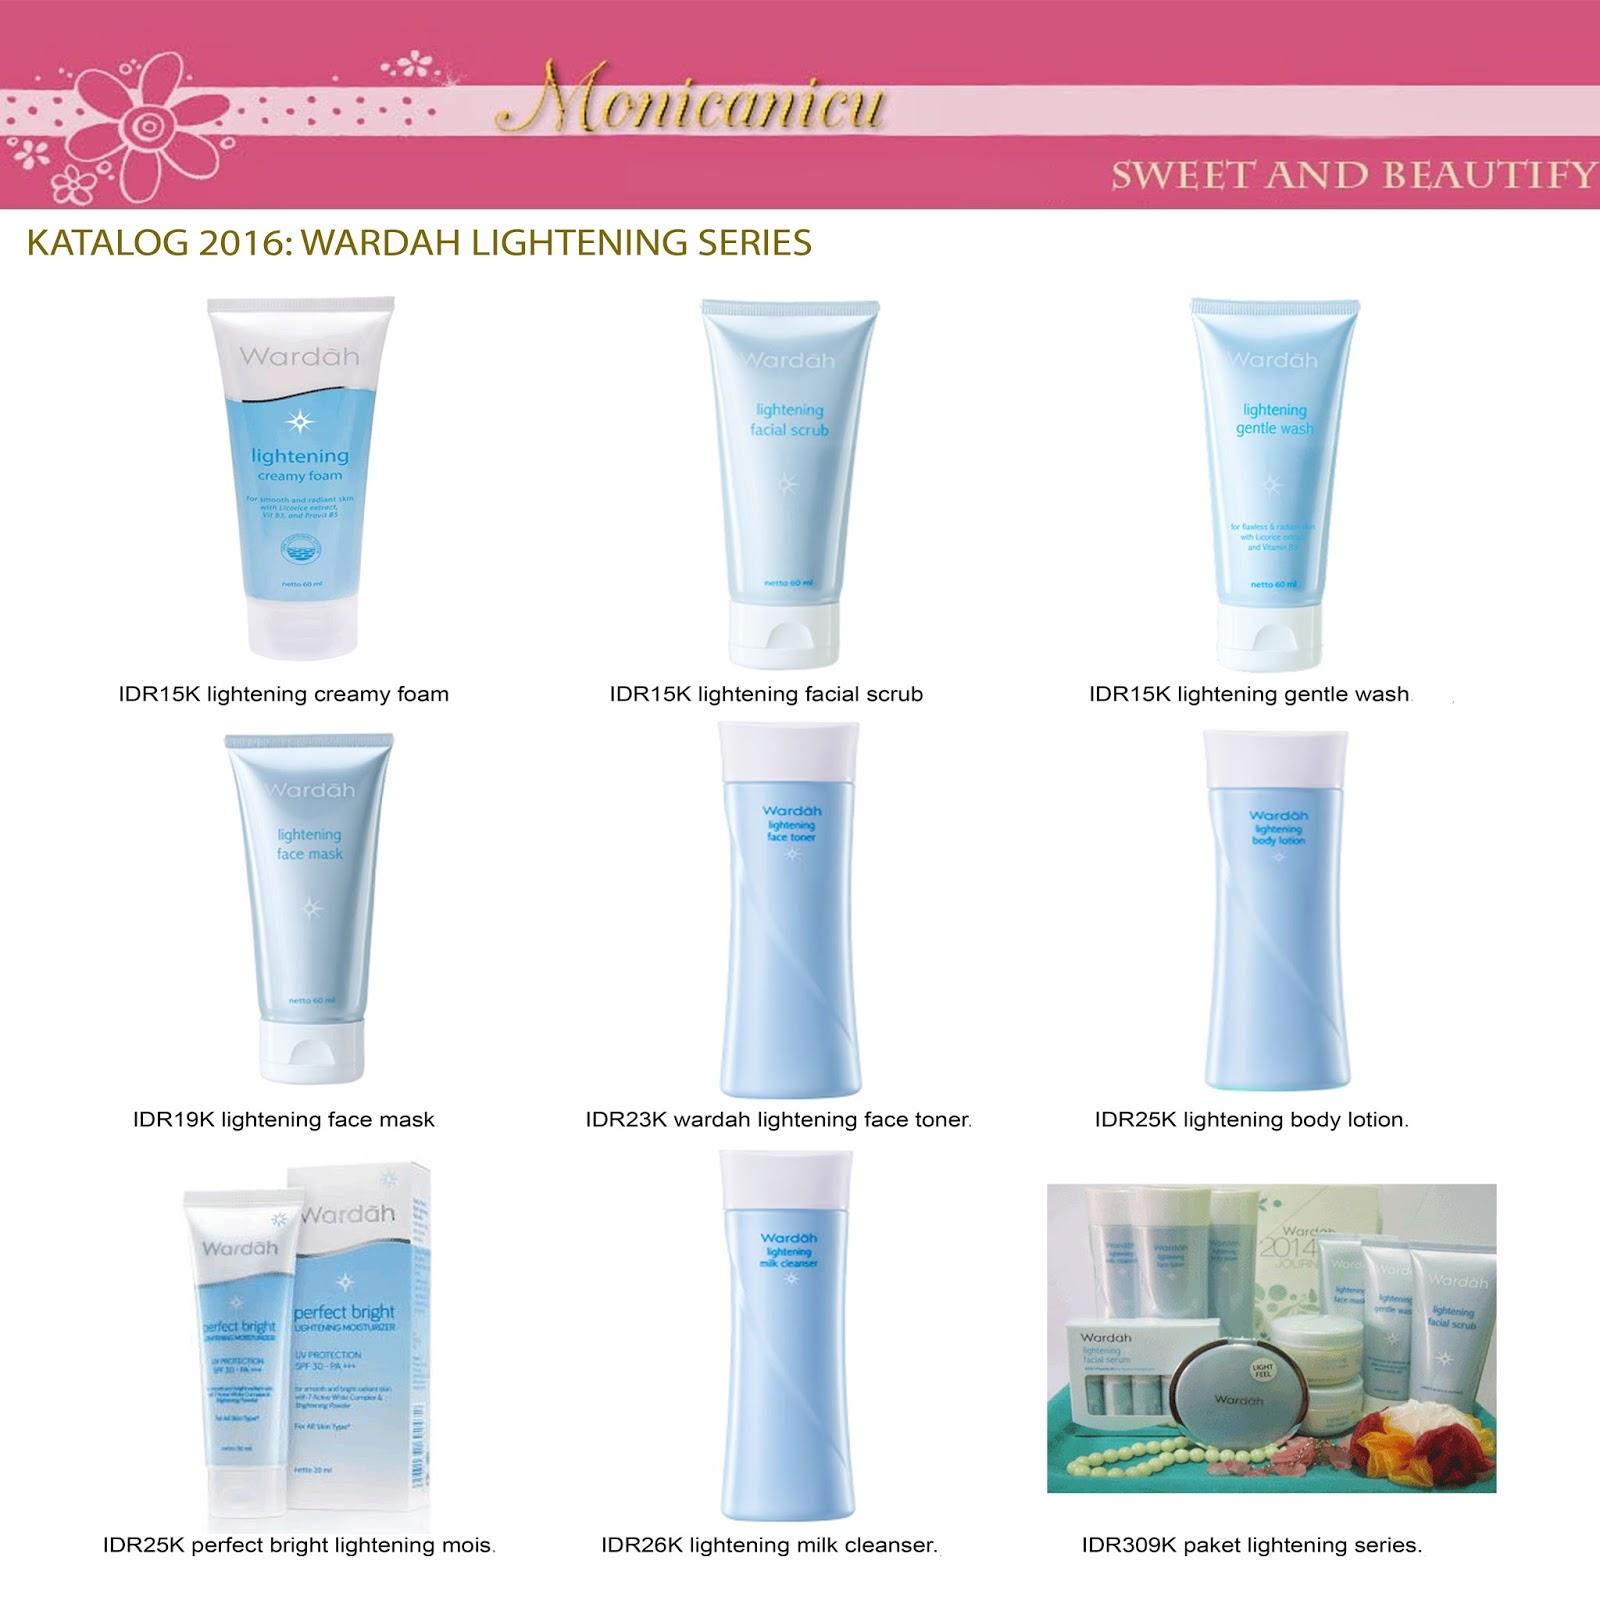 Katalog Wardah Lightening Series Monicanicu Creamy Foam